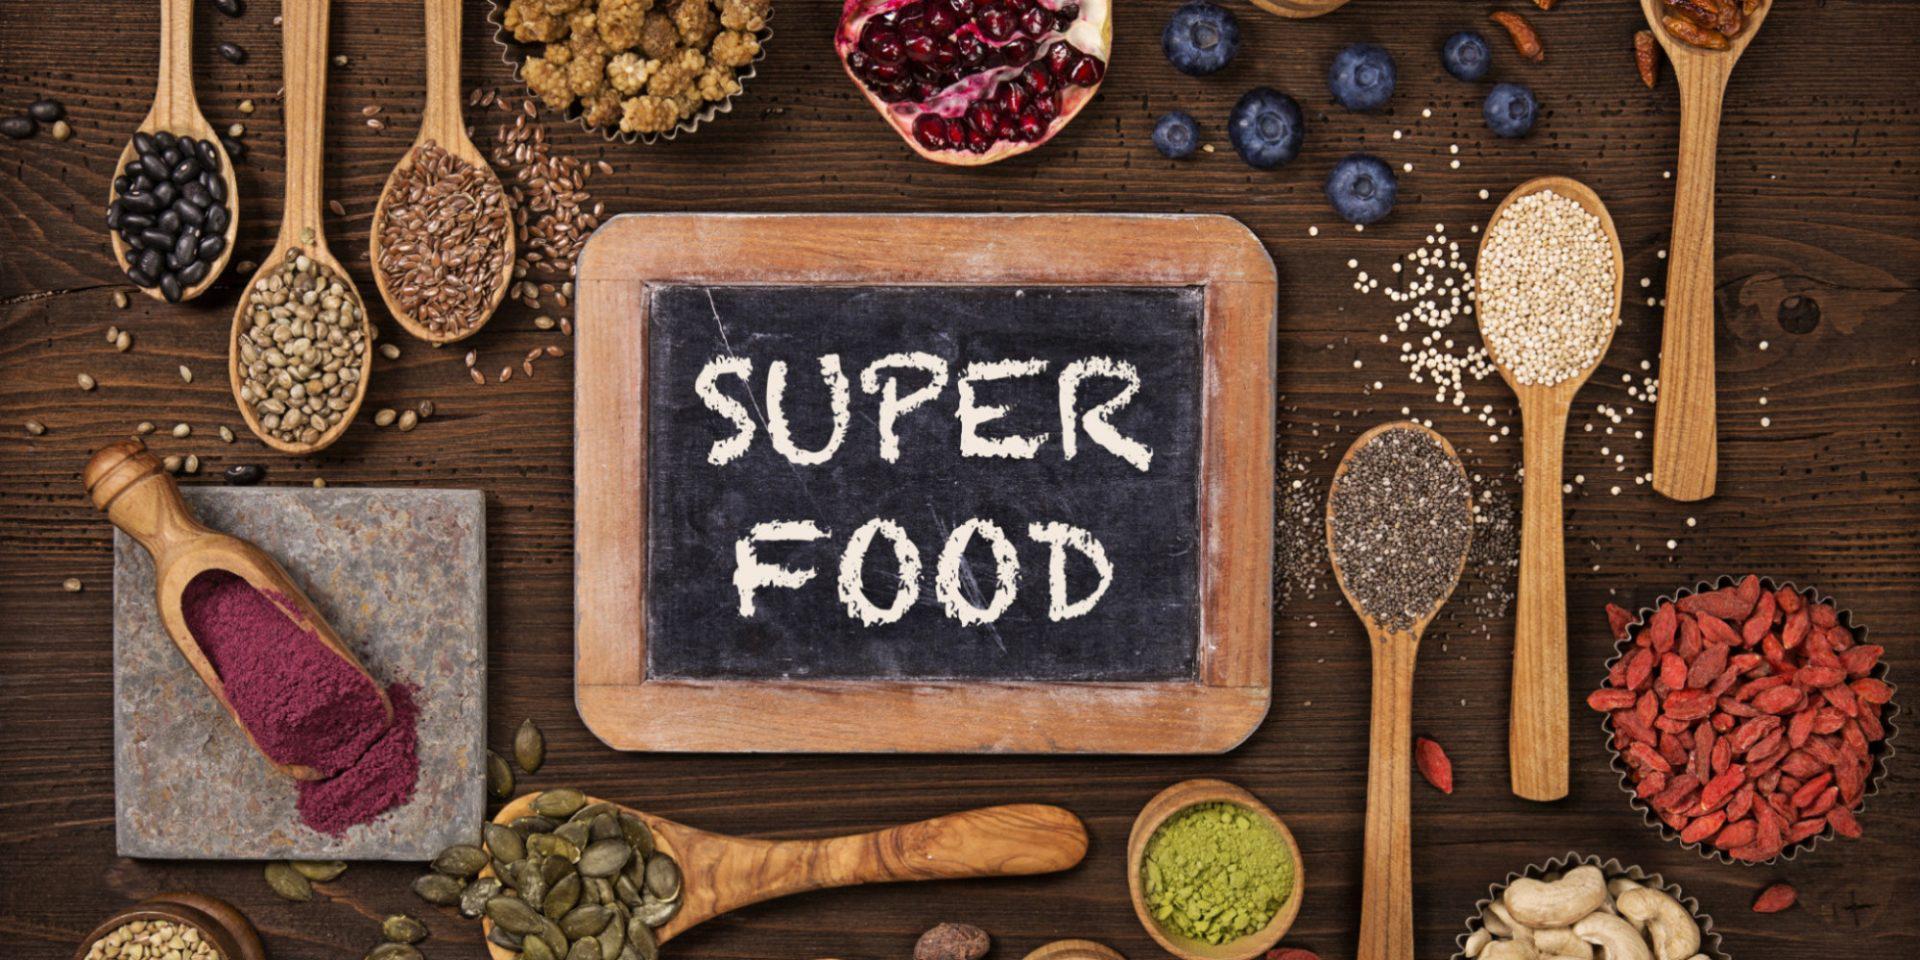 o-SUPERFOODS-facebook-1 Ποια cranberries; Ιδού τα ελληνικά superfoods που πρέπει να τρως